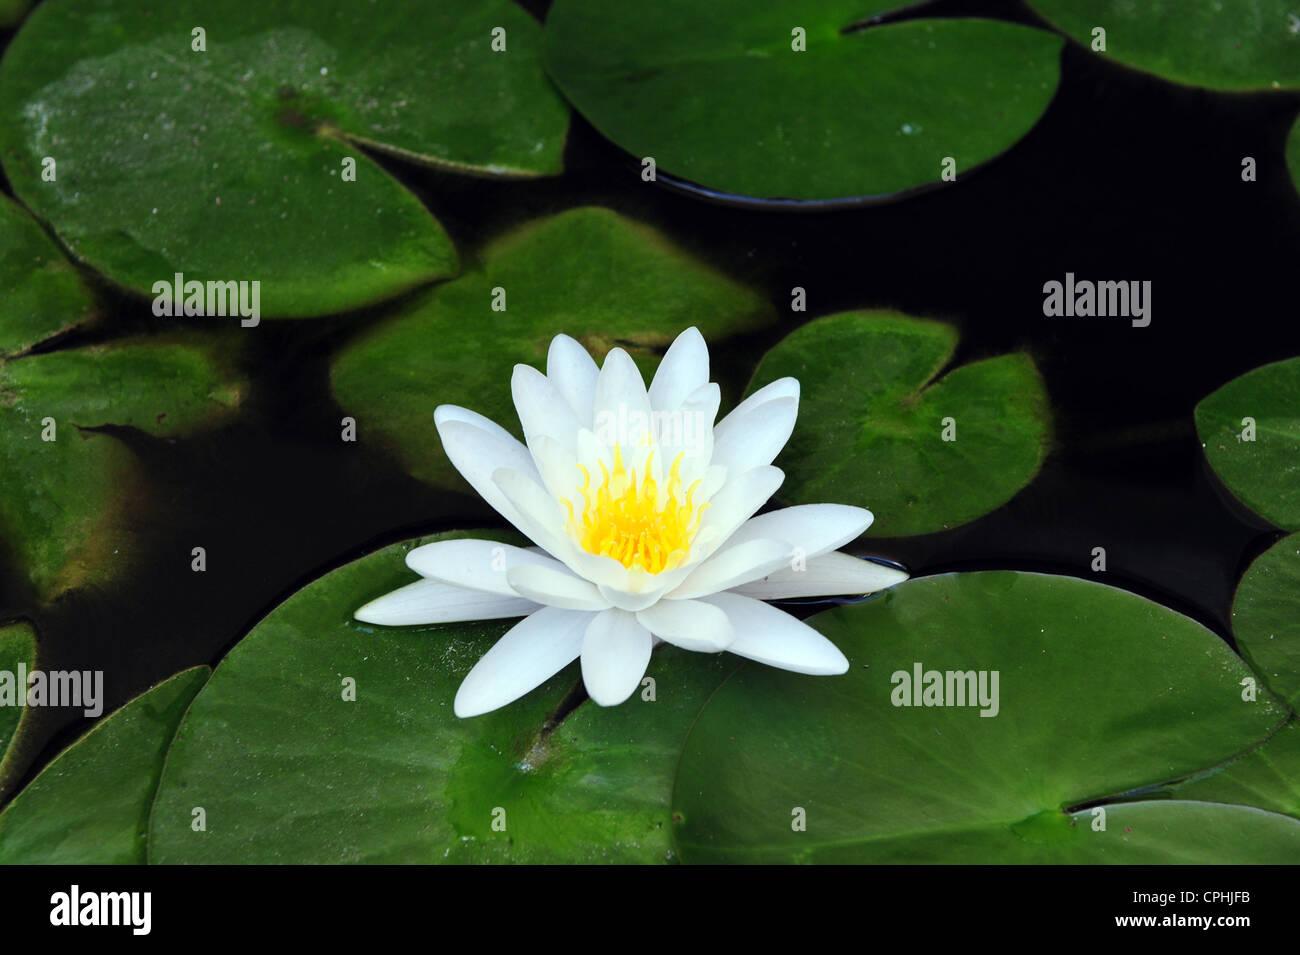 Lotus flower florist stock photos lotus flower florist stock white water lily with lotus leaf on pond stock image mightylinksfo